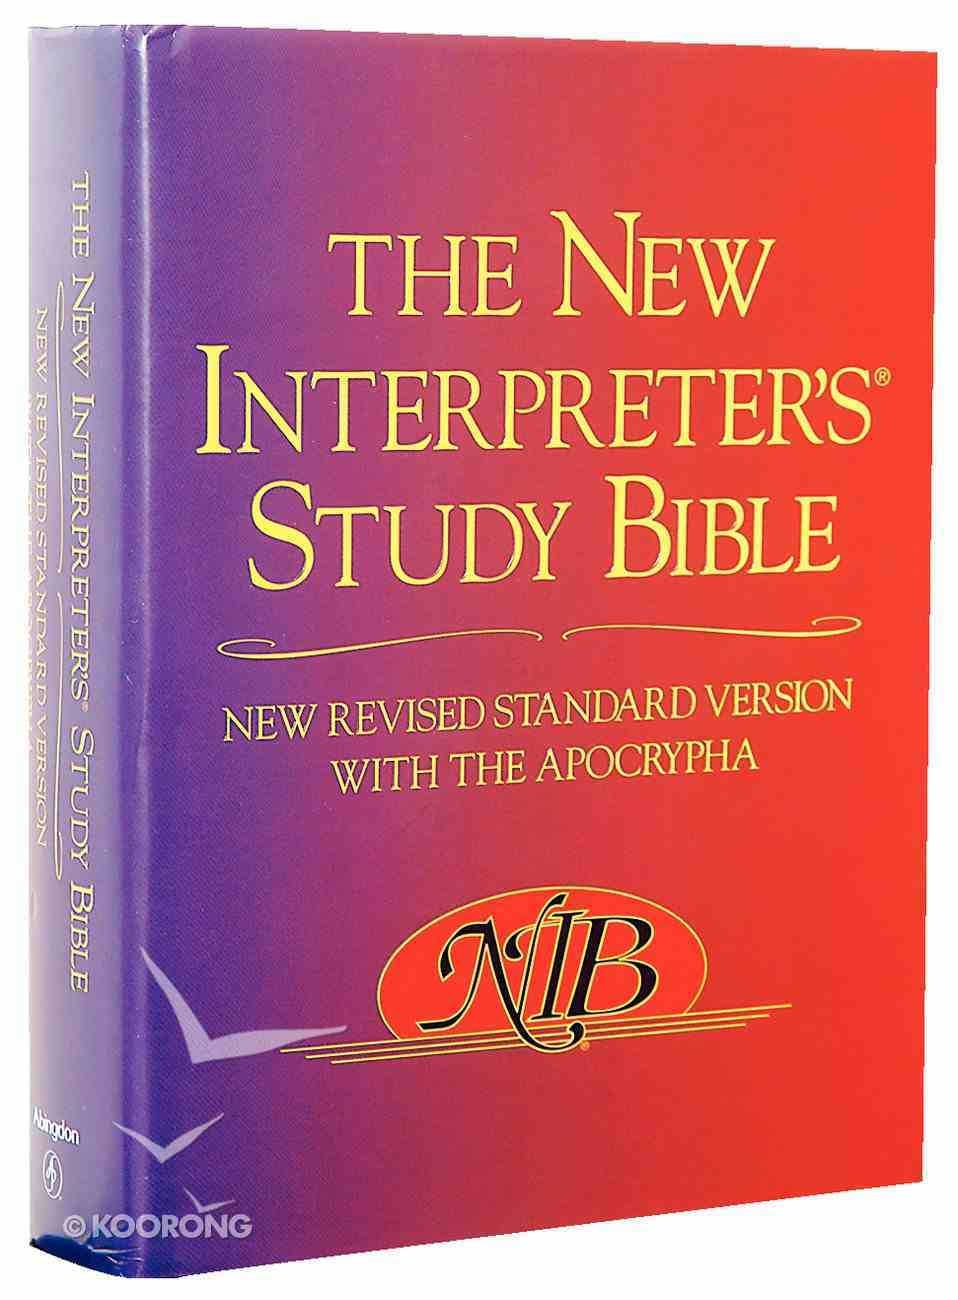 NRSV New Interpreter's Study Bible With Apocrypha Hardback